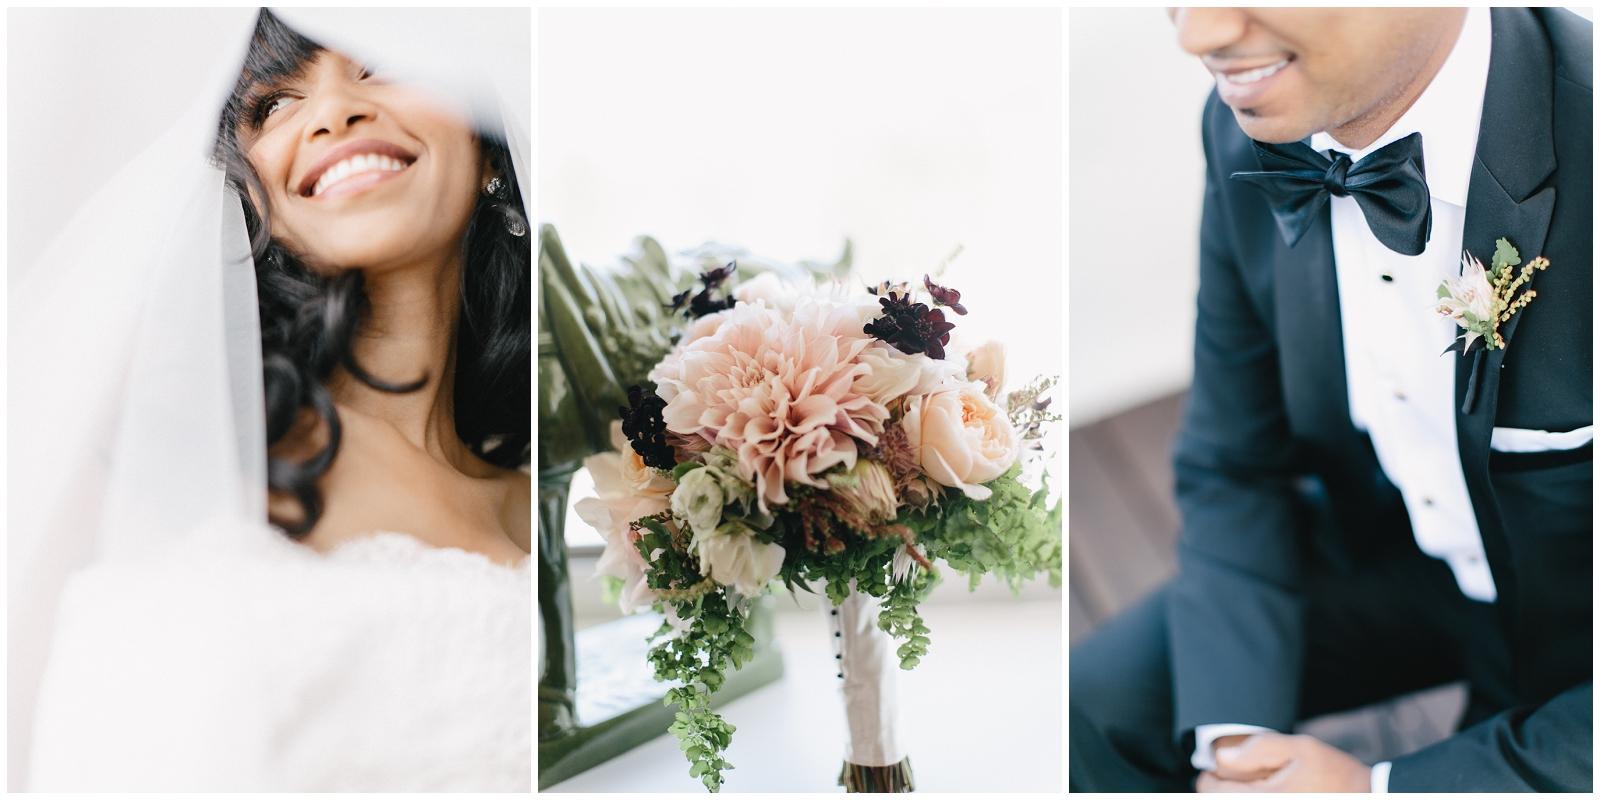 San-Francisco-Bay-Area-Wedding-Photography-Claremont-Hotel-3.jpg